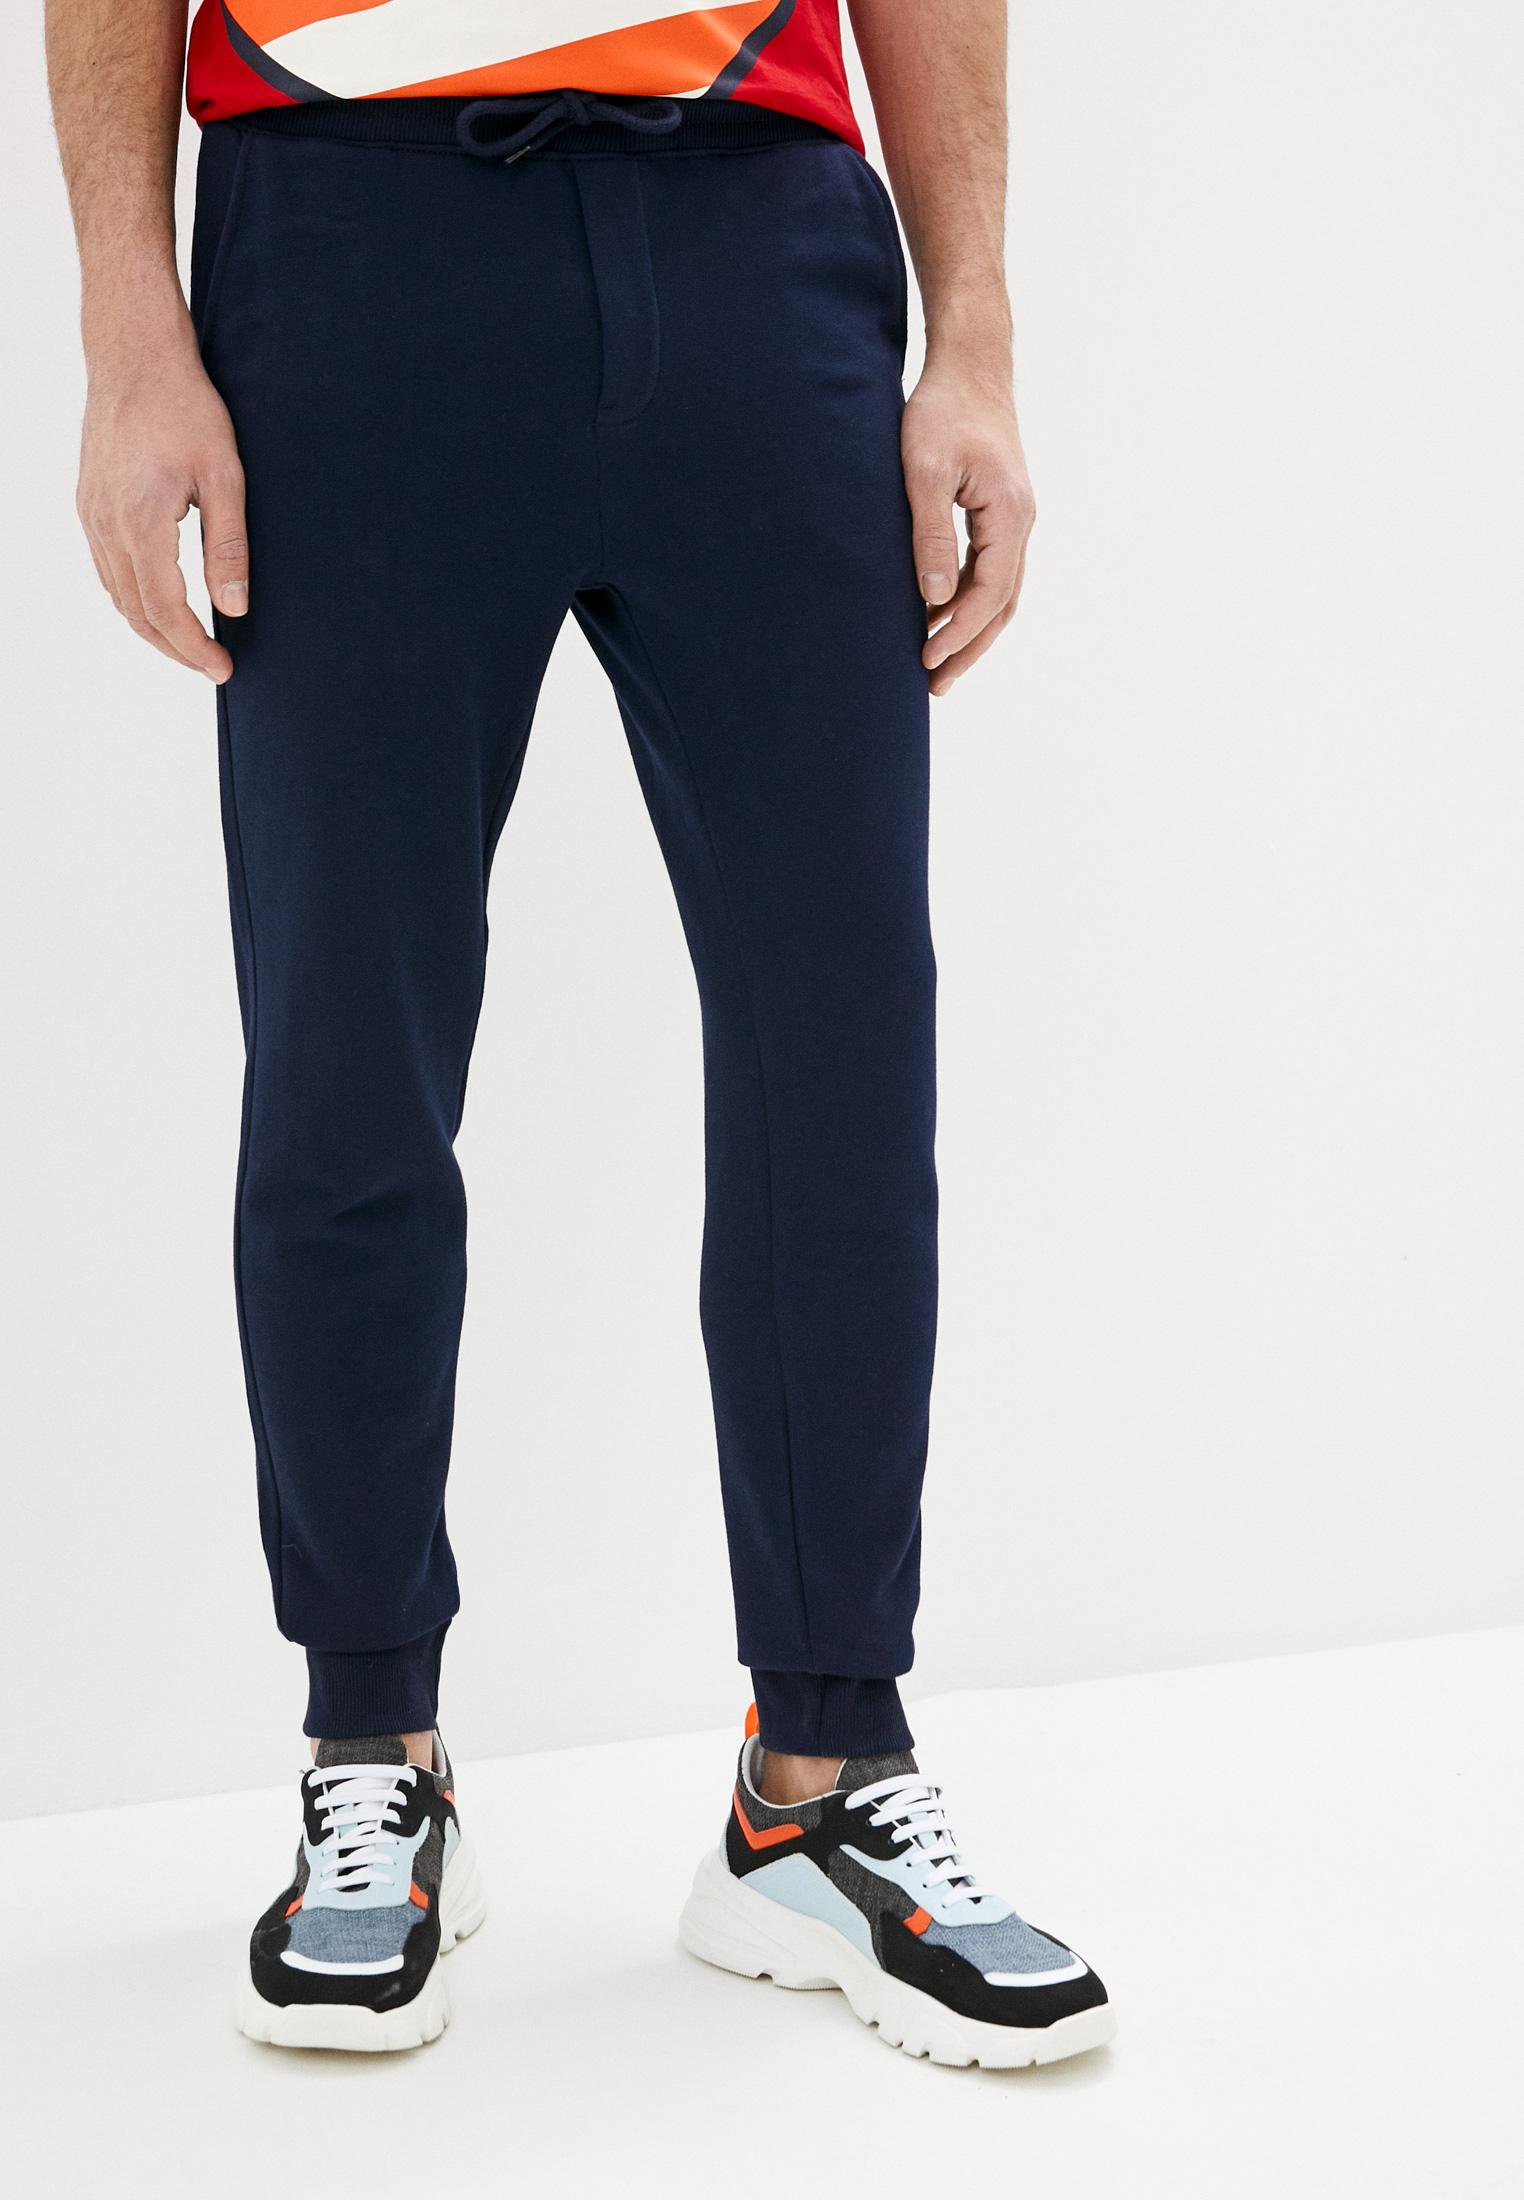 Мужские спортивные брюки United Colors of Benetton (Юнайтед Колорс оф Бенеттон) 3J68P0475